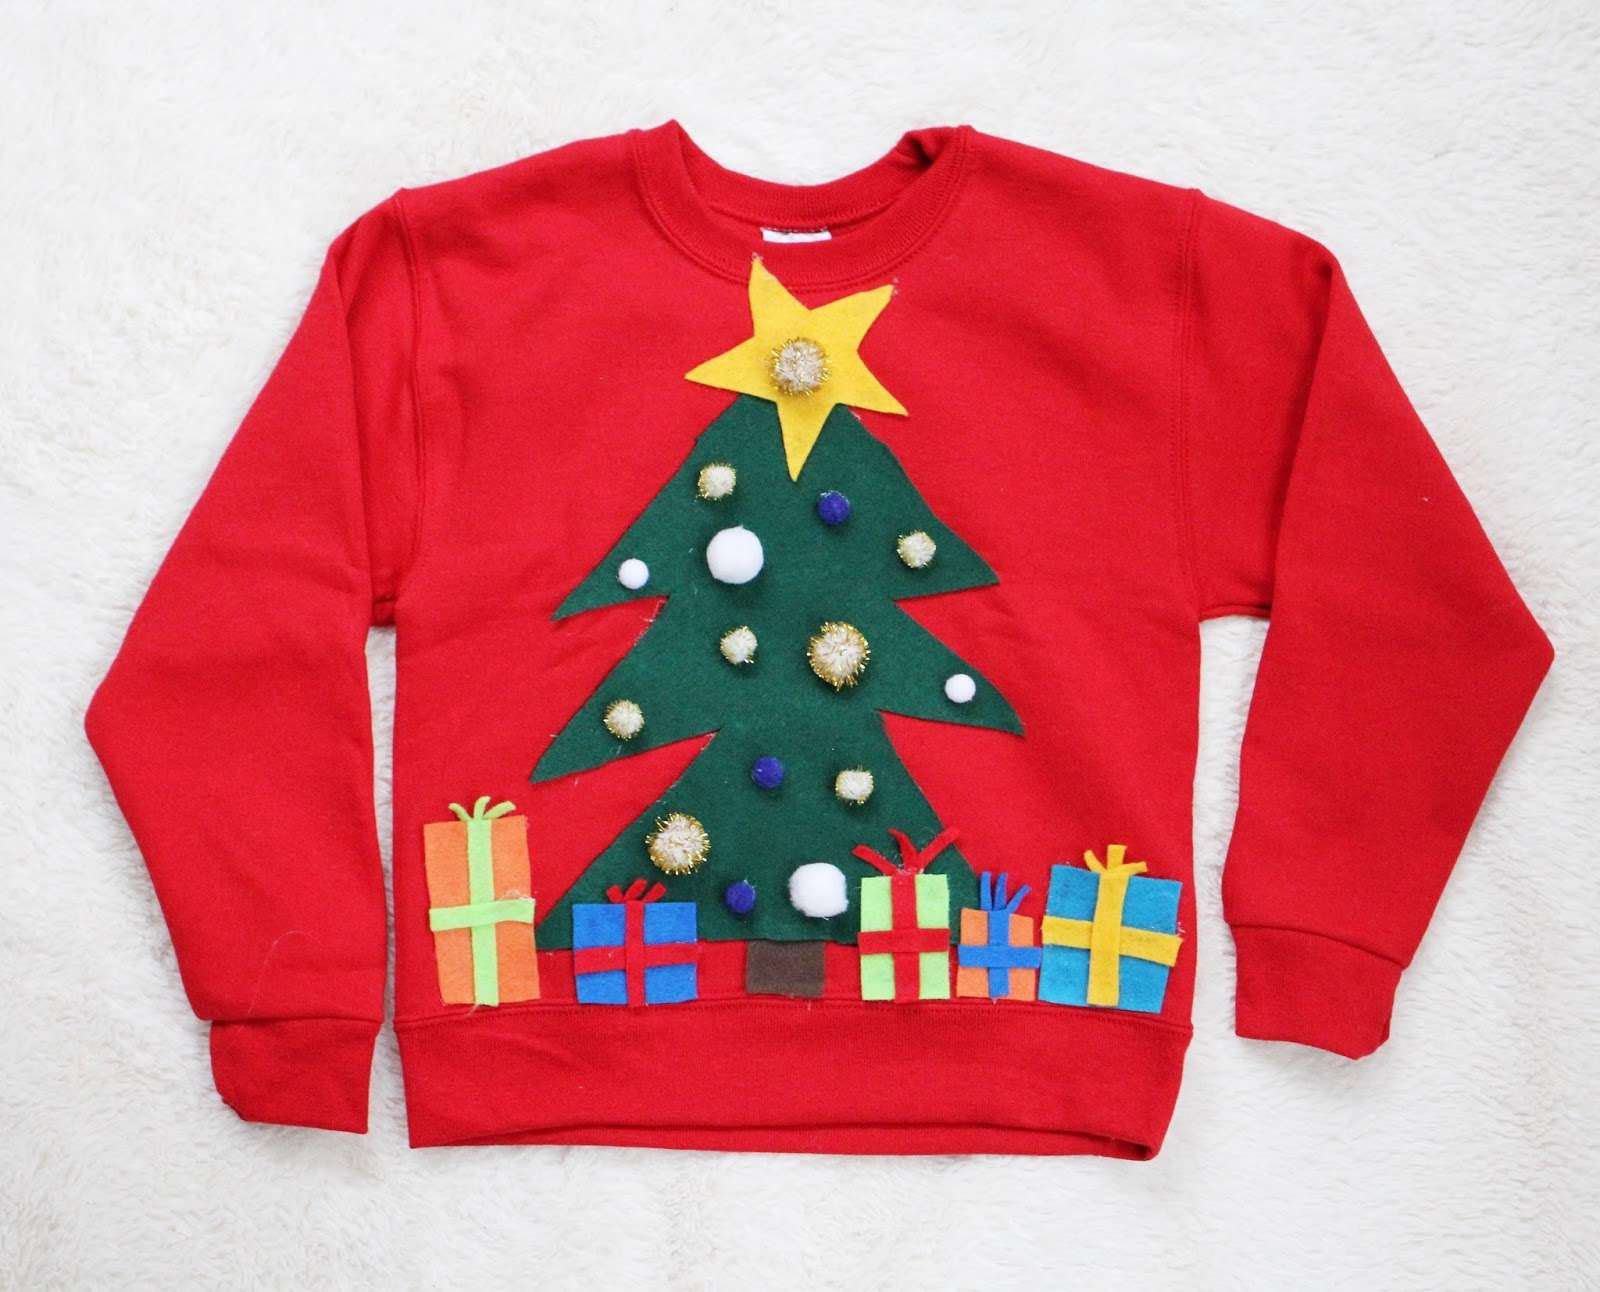 A red kids Christmas sweatshirt